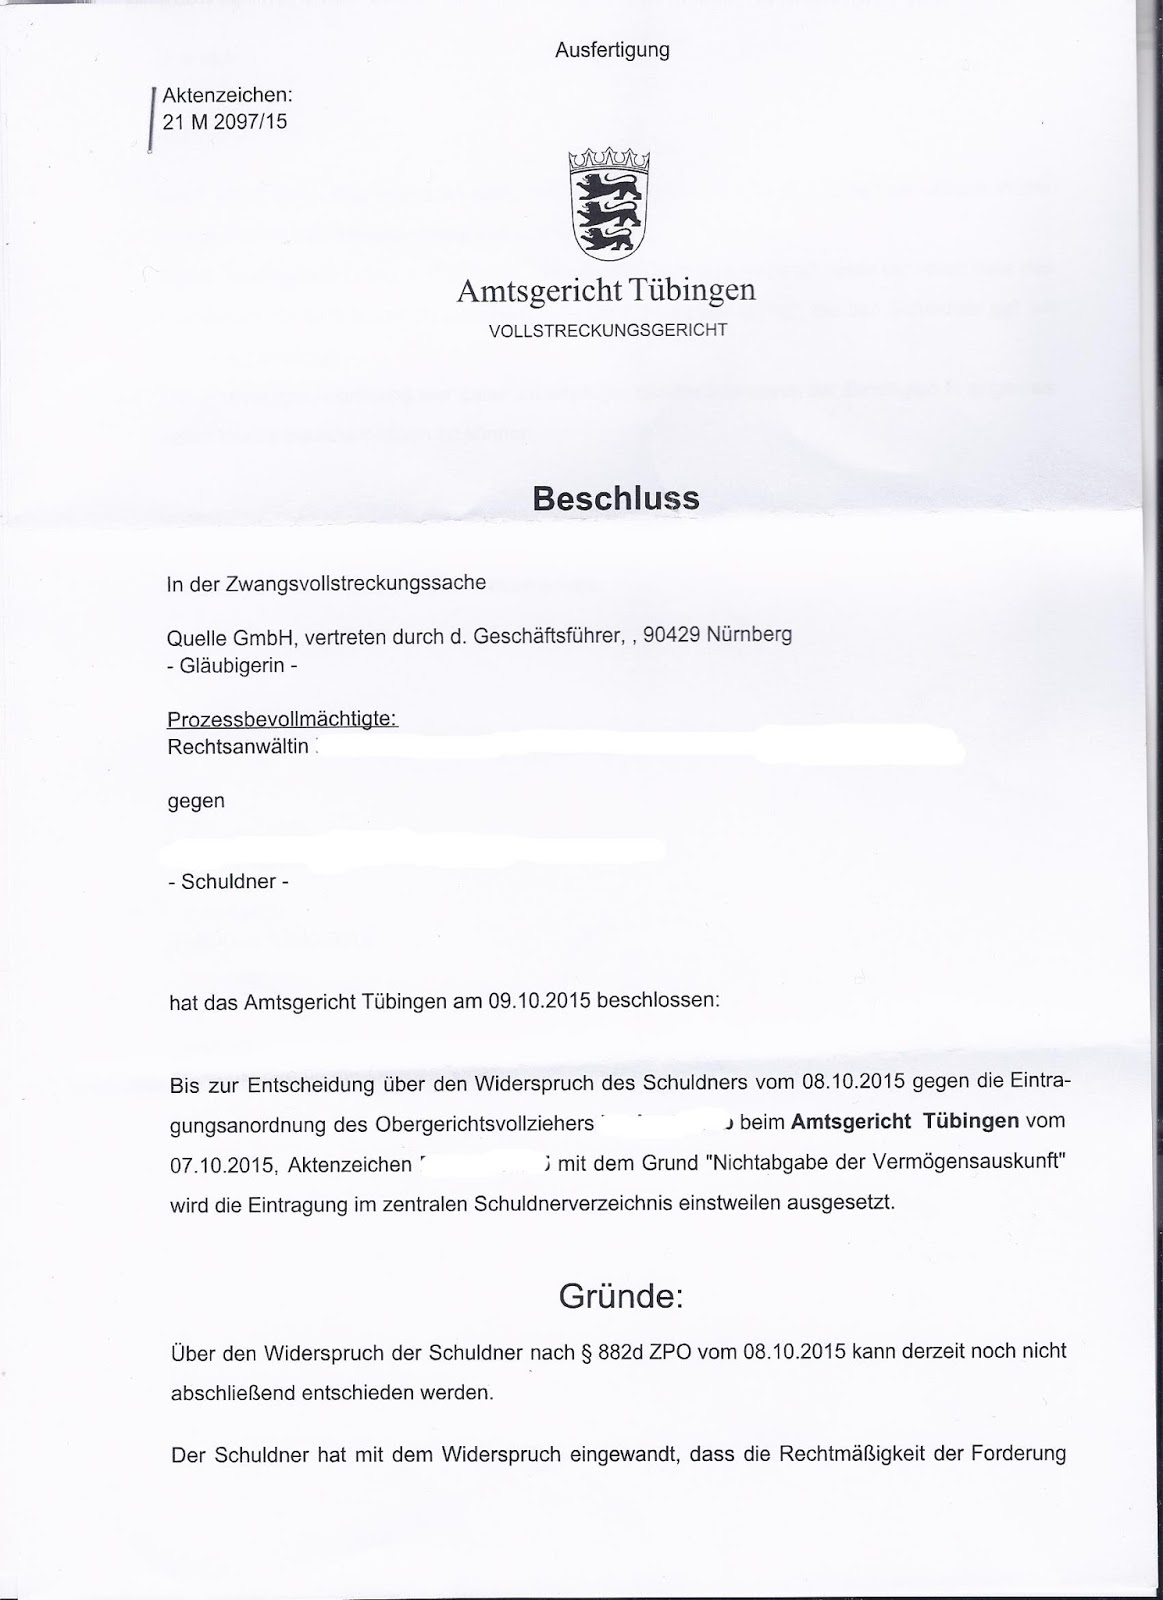 Beitragsservice Stoppen Amtsgericht Tübingen Stoppt Gerichtsvollzieher